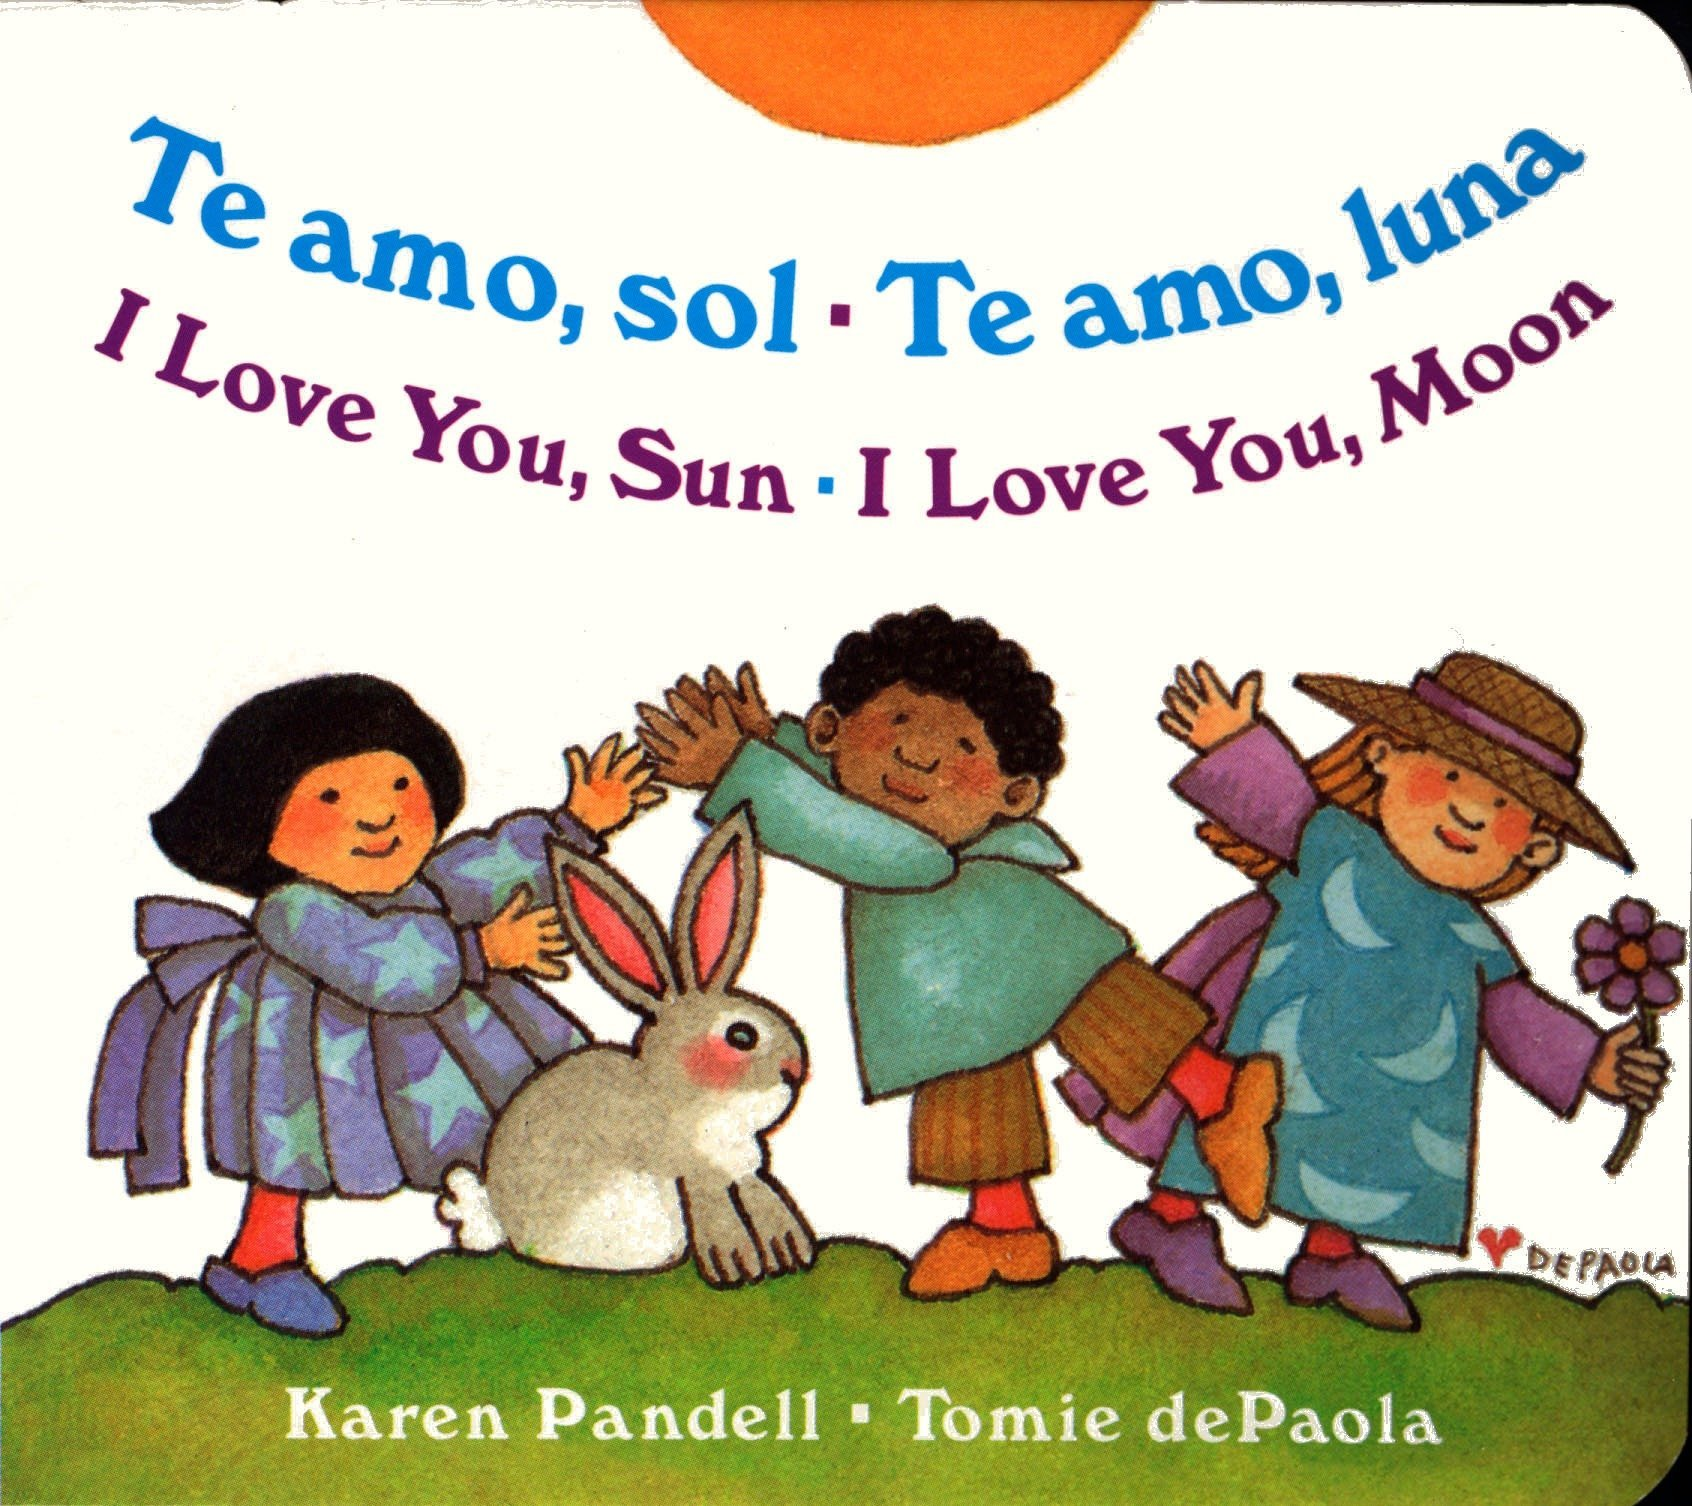 Amazon.com: I Love You Sun / I Love You Moon: Te amo Sol / Te amo Luna  (Spanish Edition) (9780399241659): Karen Pandell, Tomie dePaola: Books